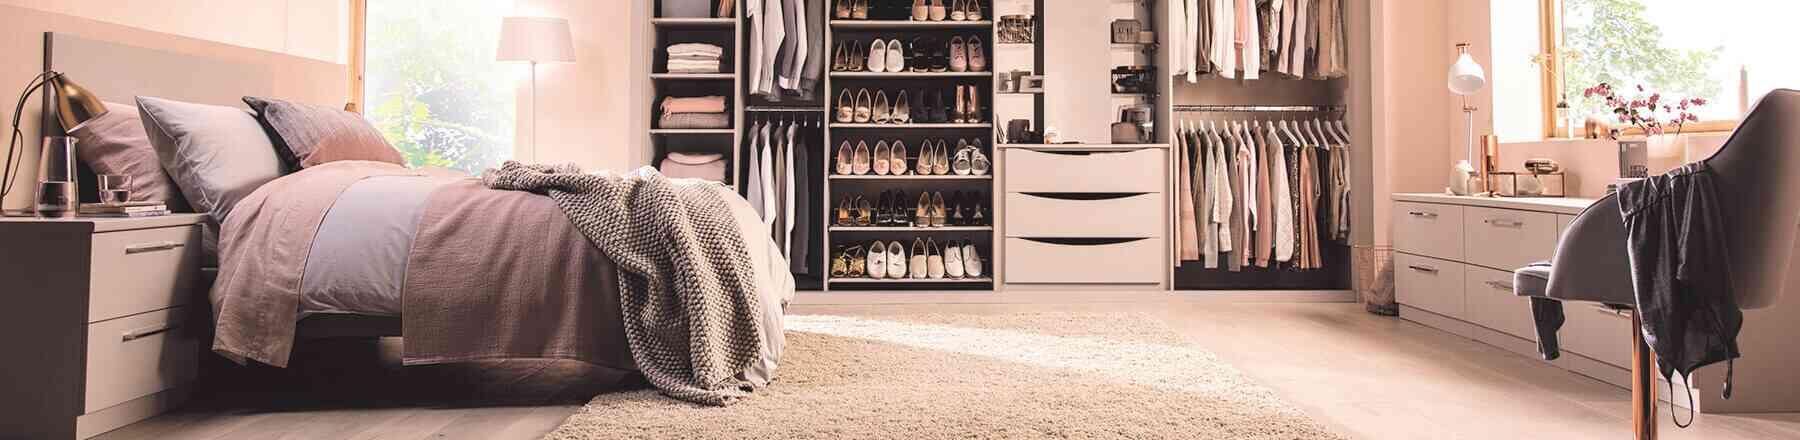 Sharps Bedrooms Fitted Wardrobes Bedroom Furniture